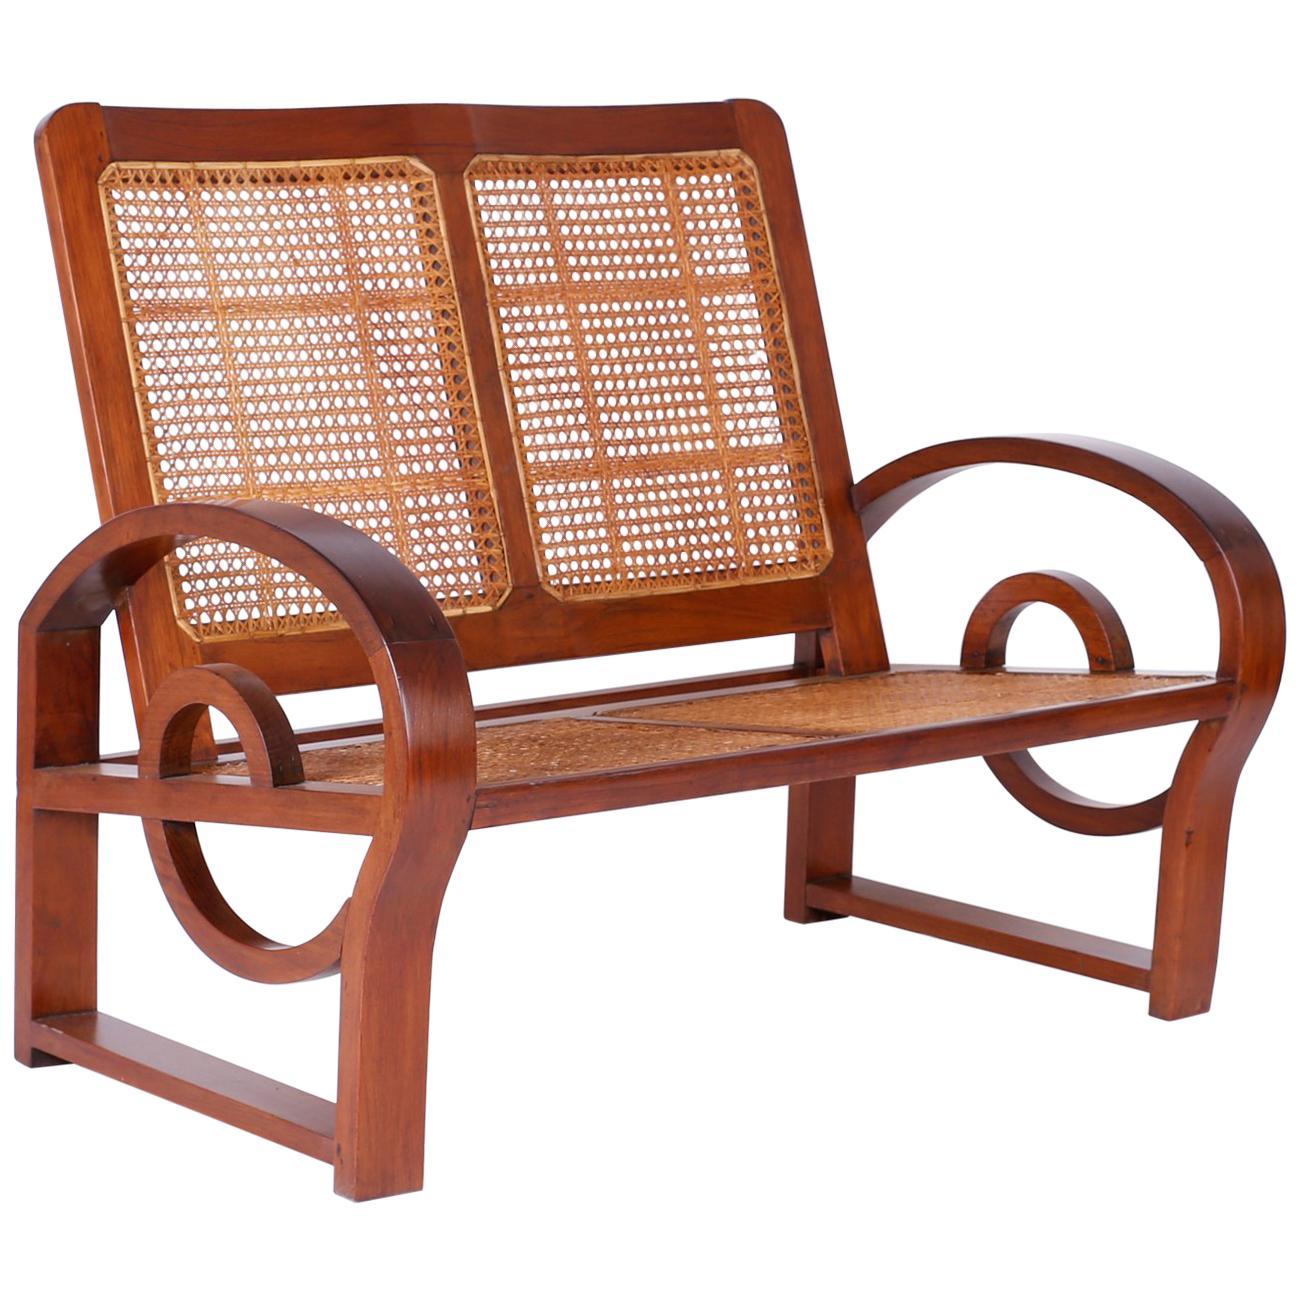 Amazing Art Nouveau Style West Indies Settee For Sale